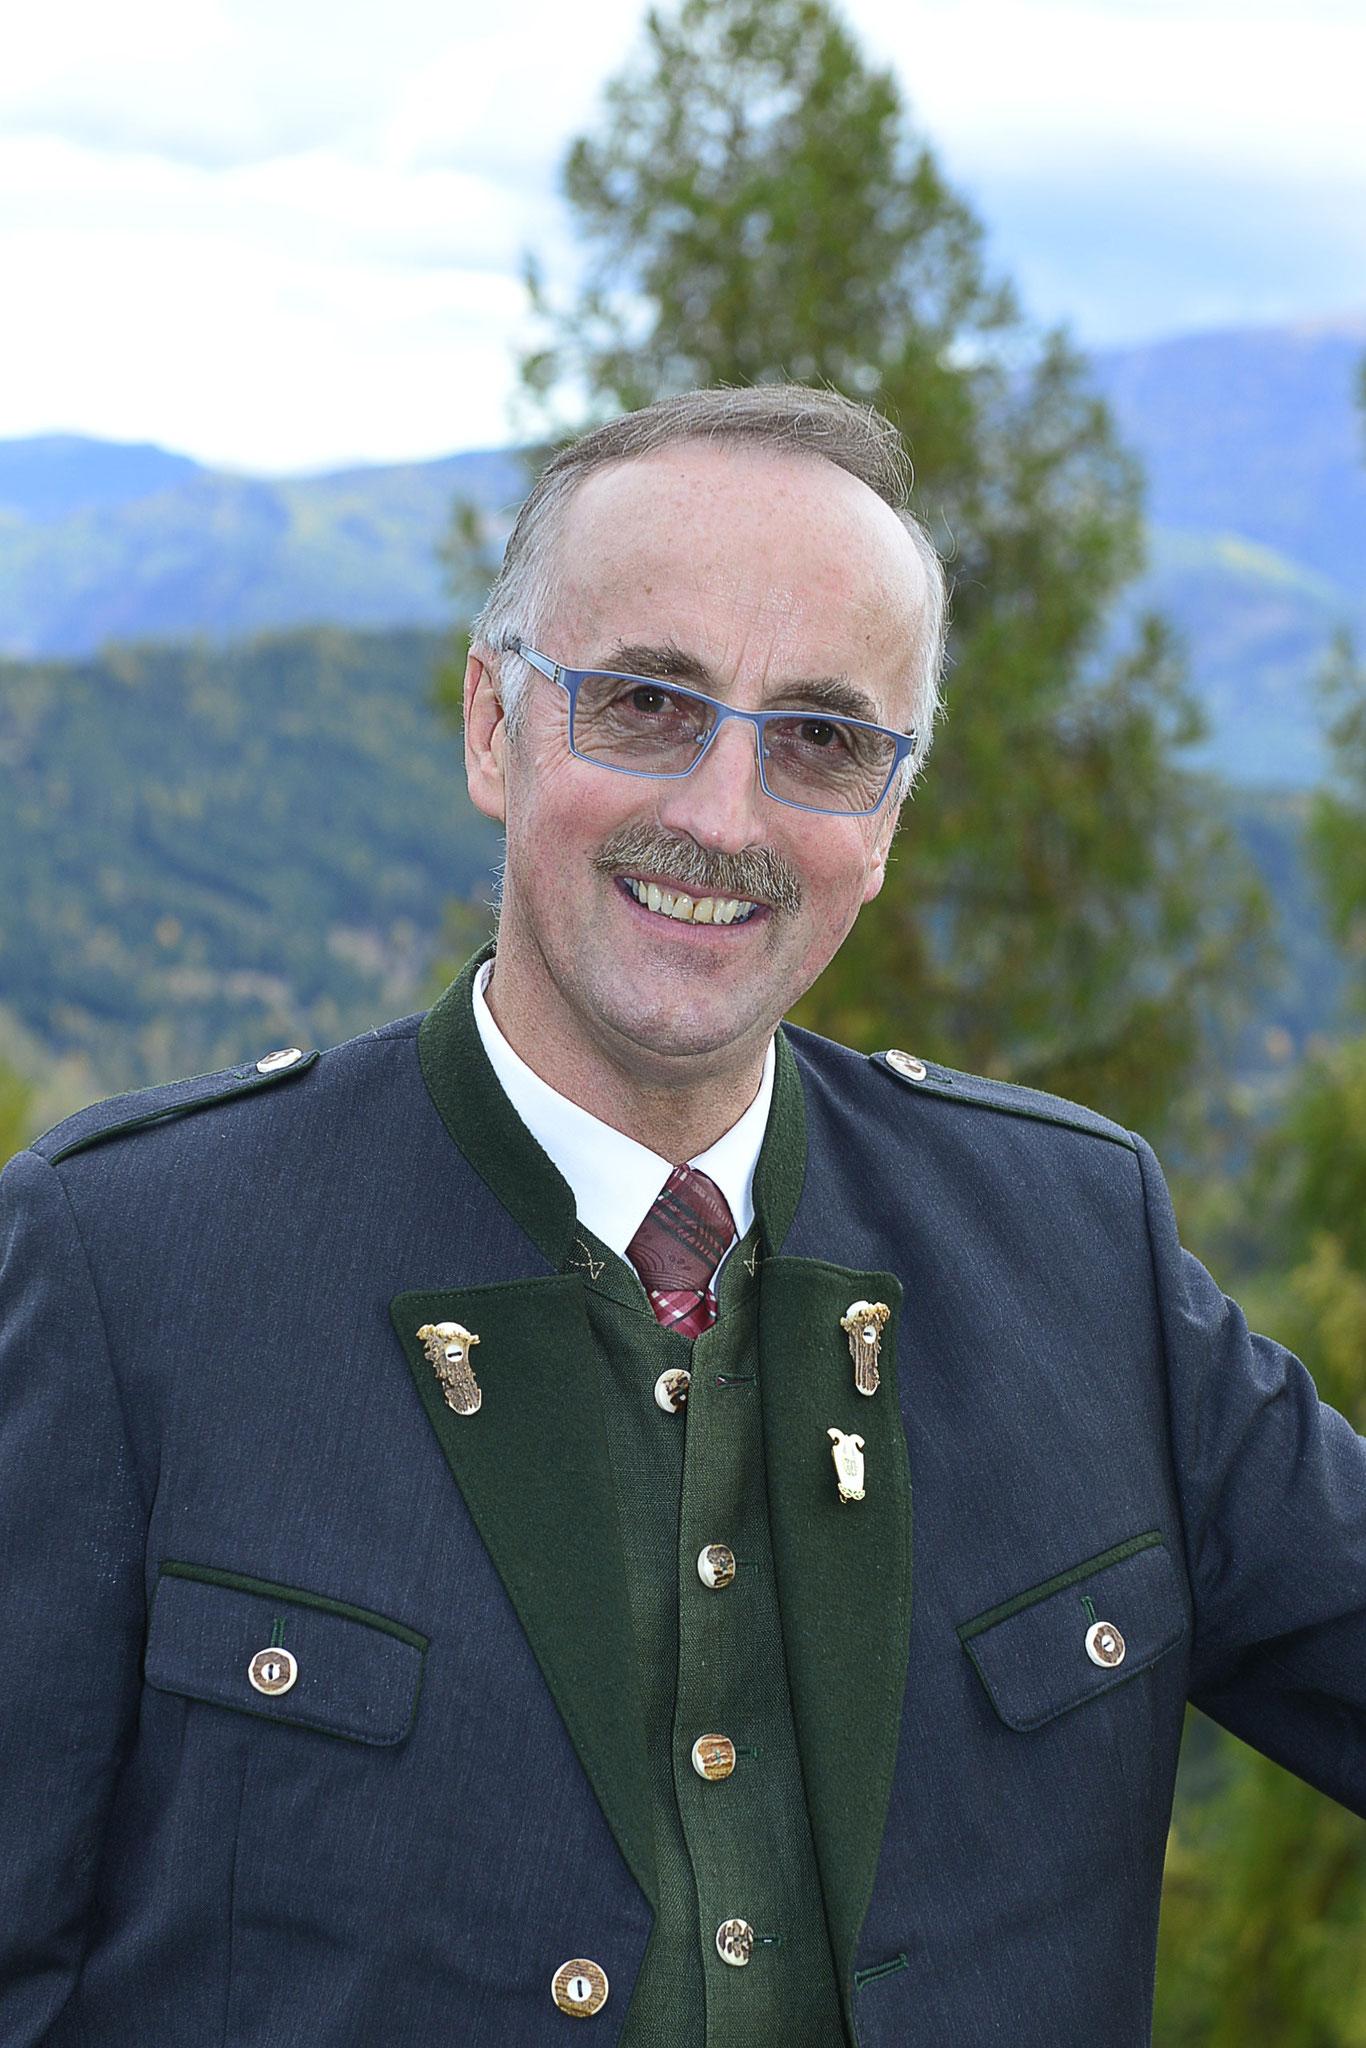 Herbert Bacher